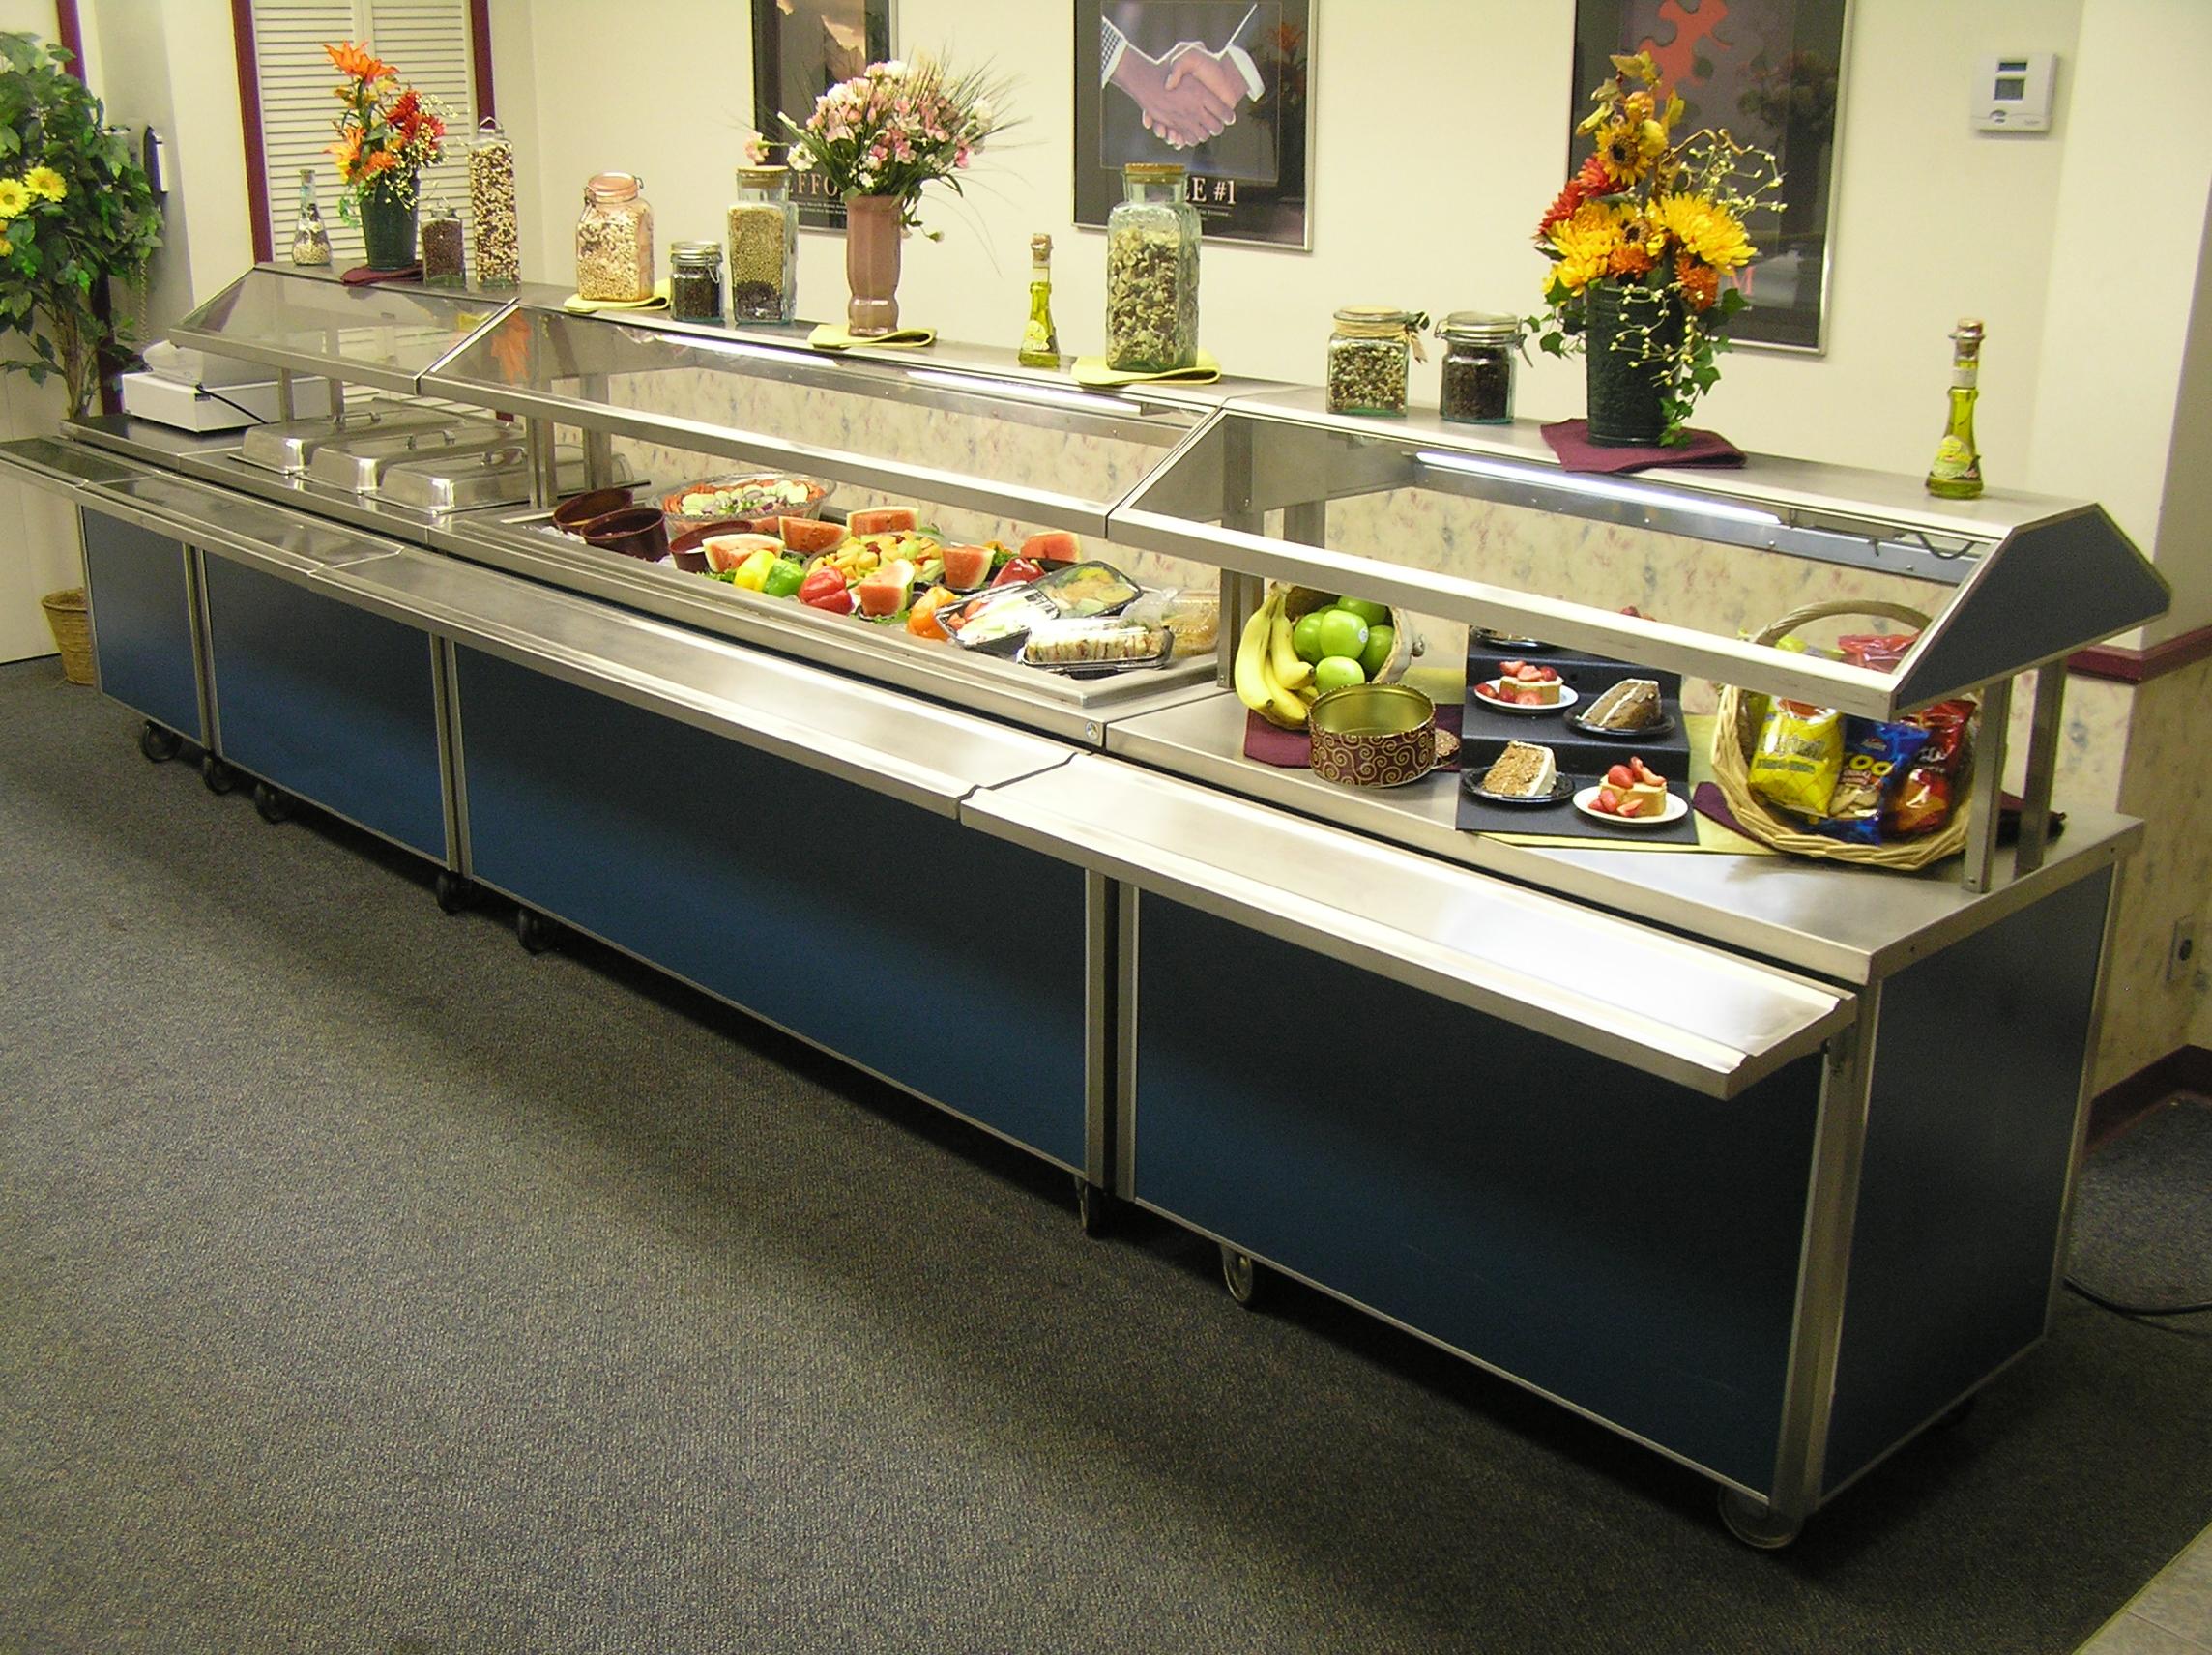 Food Service companies